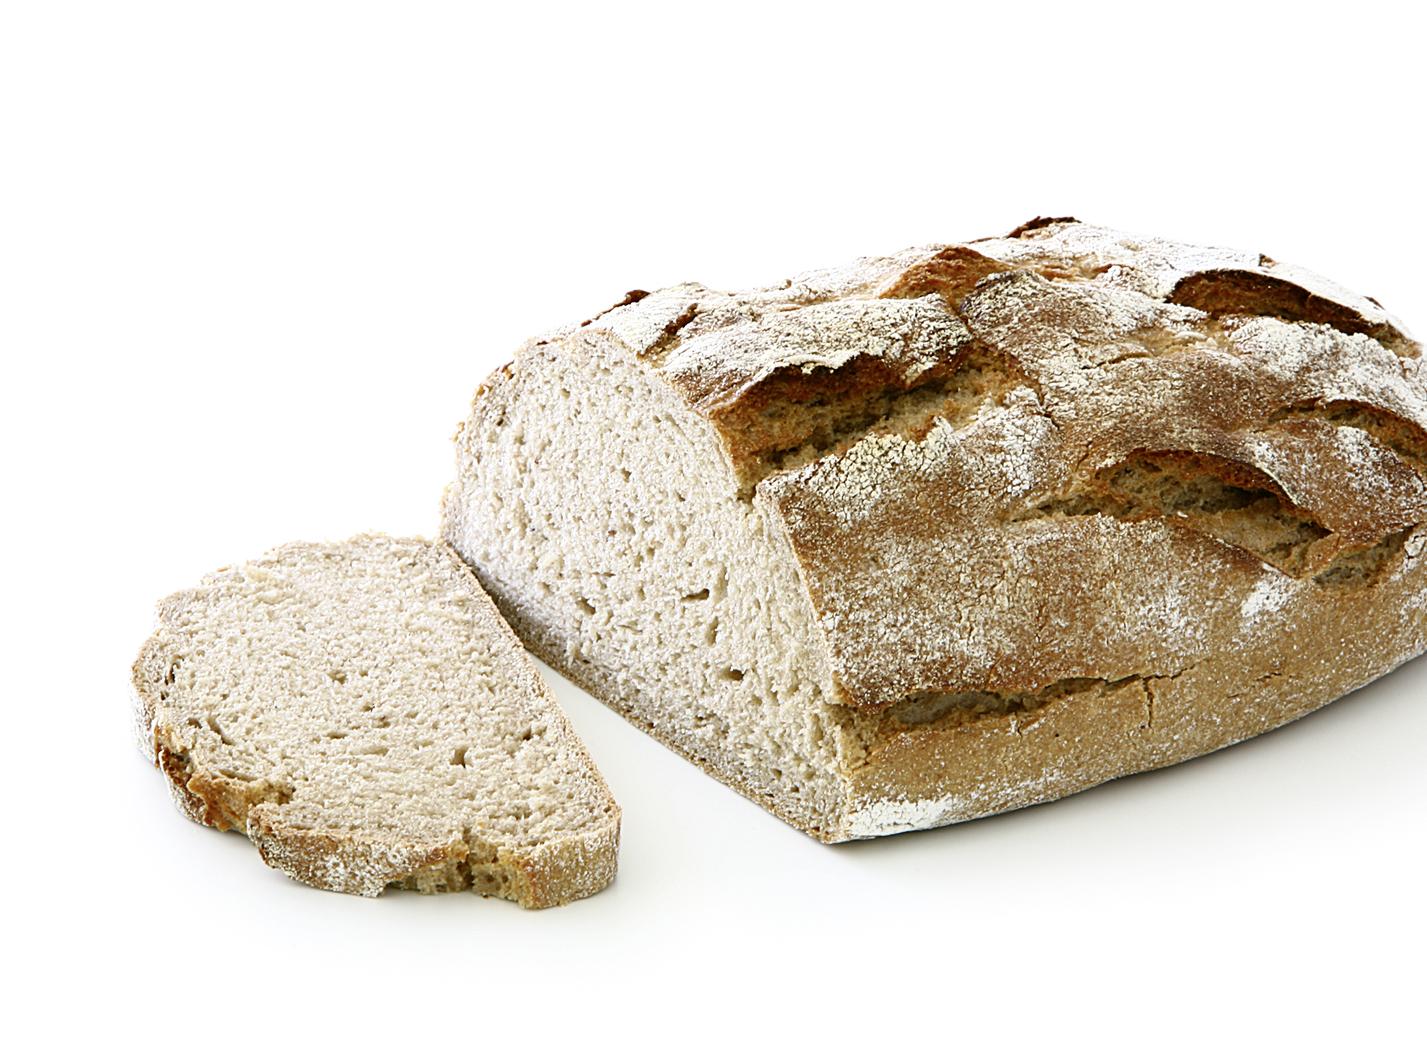 Crusty Bread - Rye mixed bread with 32% rye flour length: 30 cm